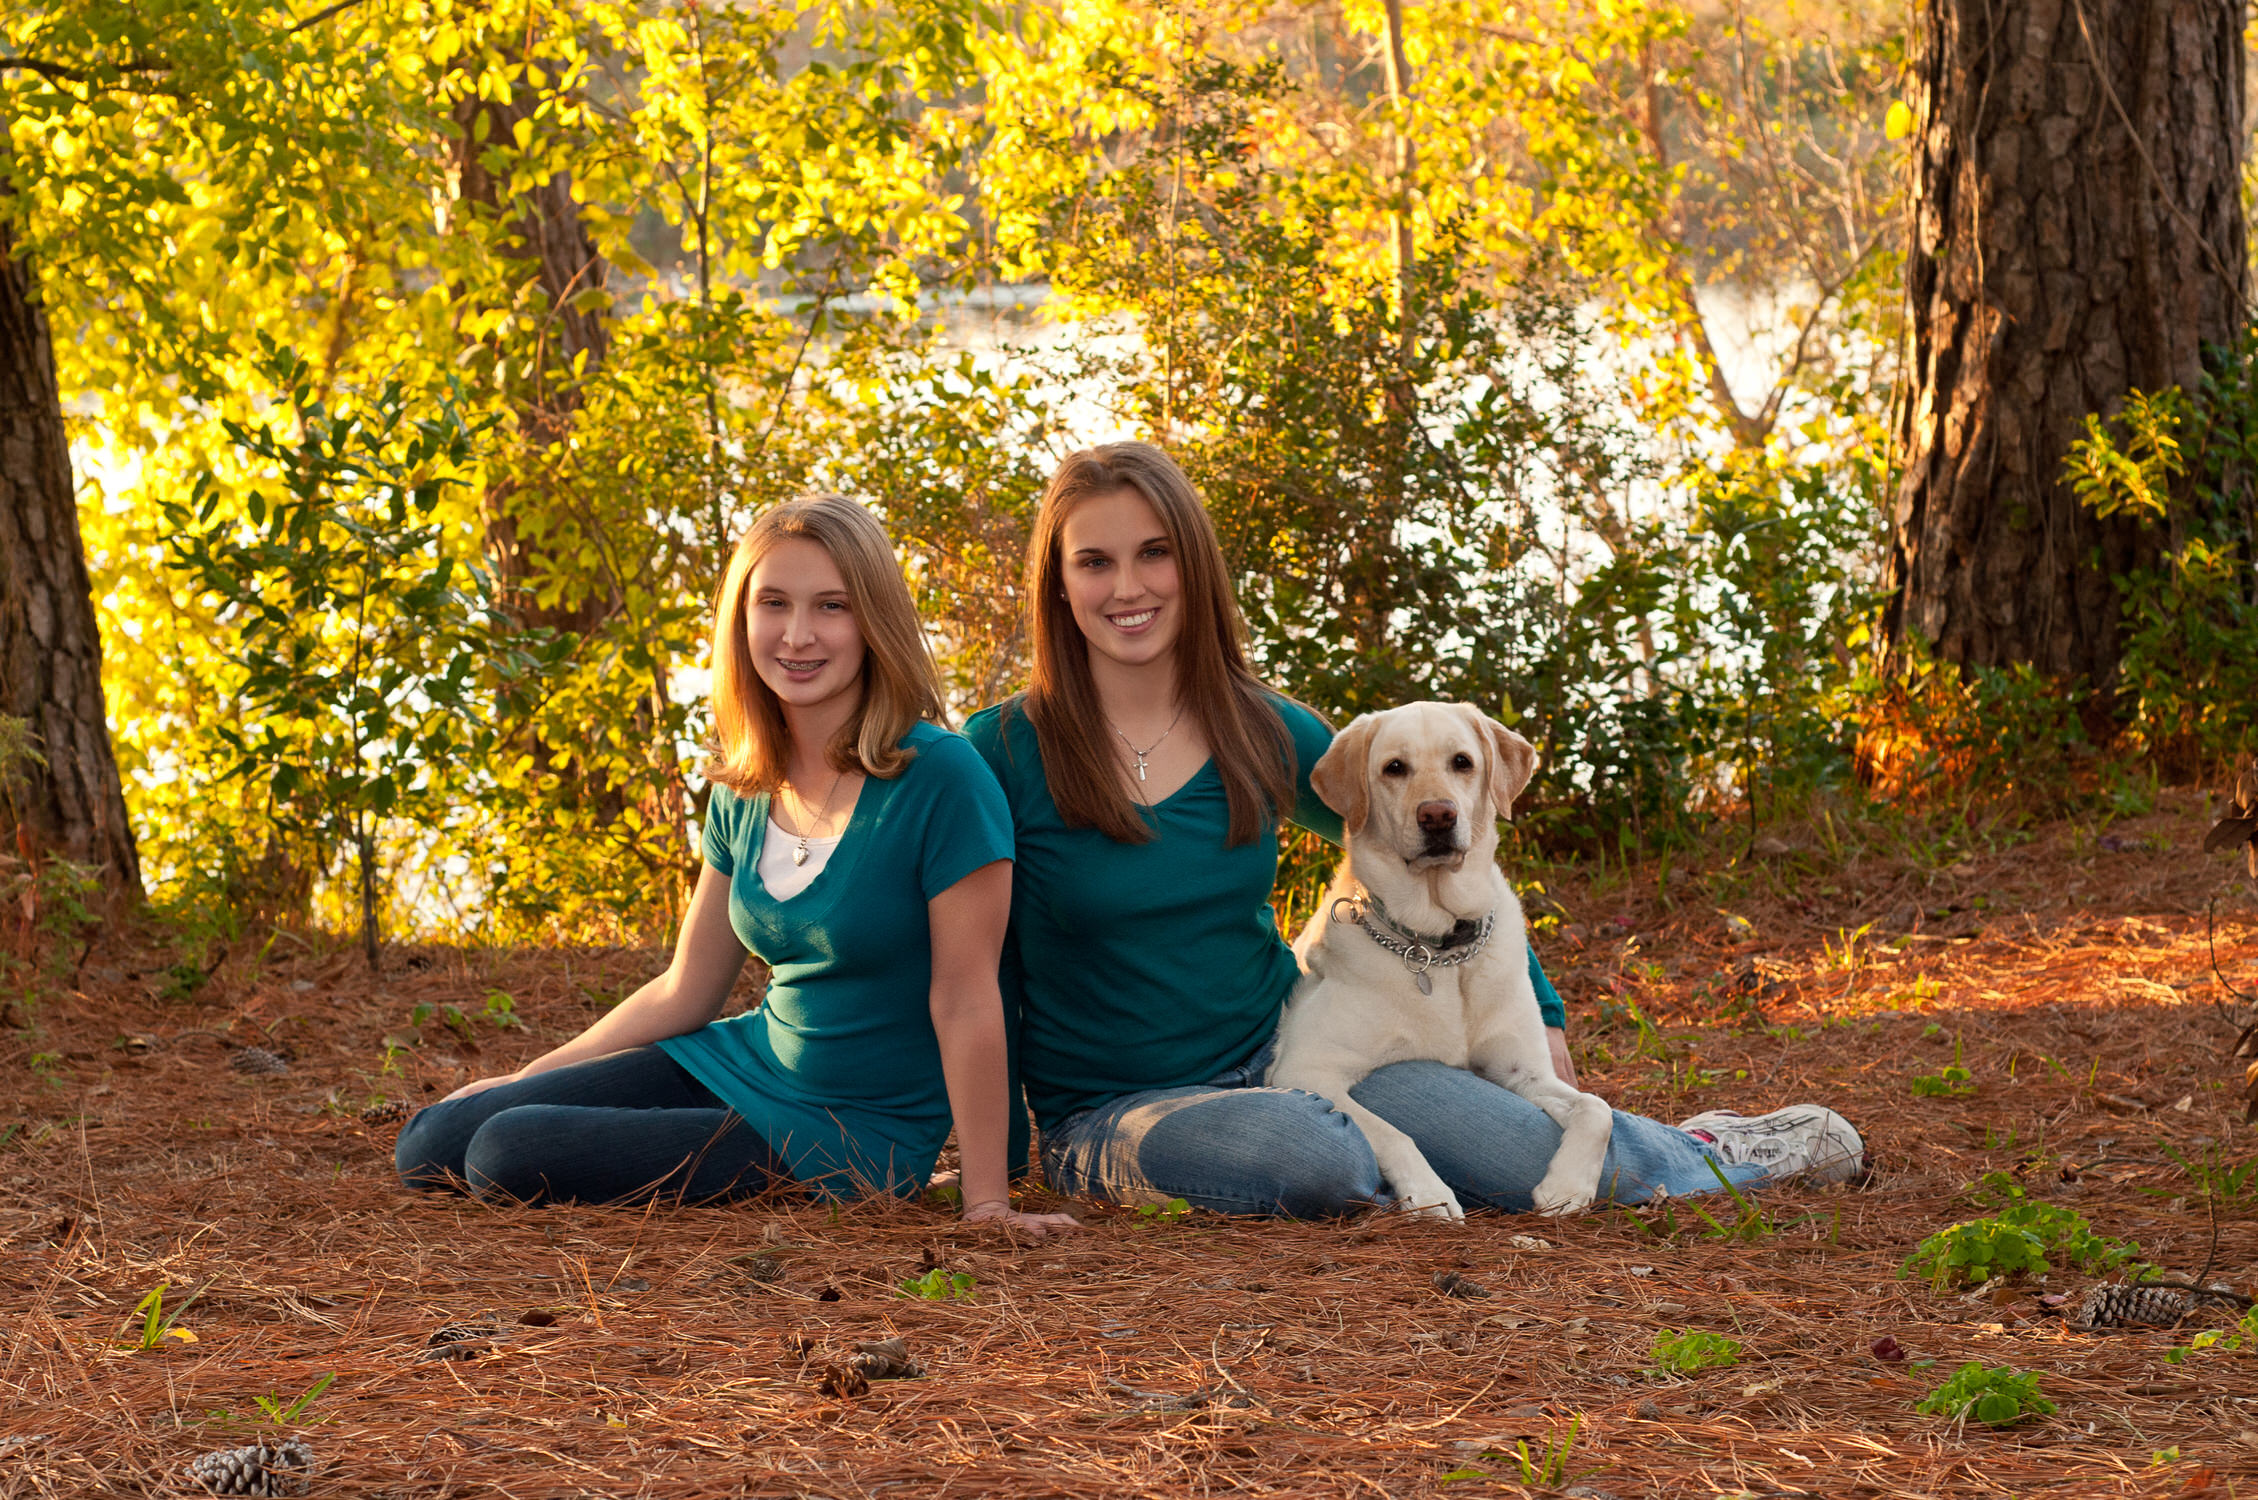 Kim-Riley-Portraitr-Editorial-Advertising-Best-Top-teens-Photography-Family-lifestyle-Photographer-Houston-Texas-Kingwood-Catherine-McKillop-13.jpg